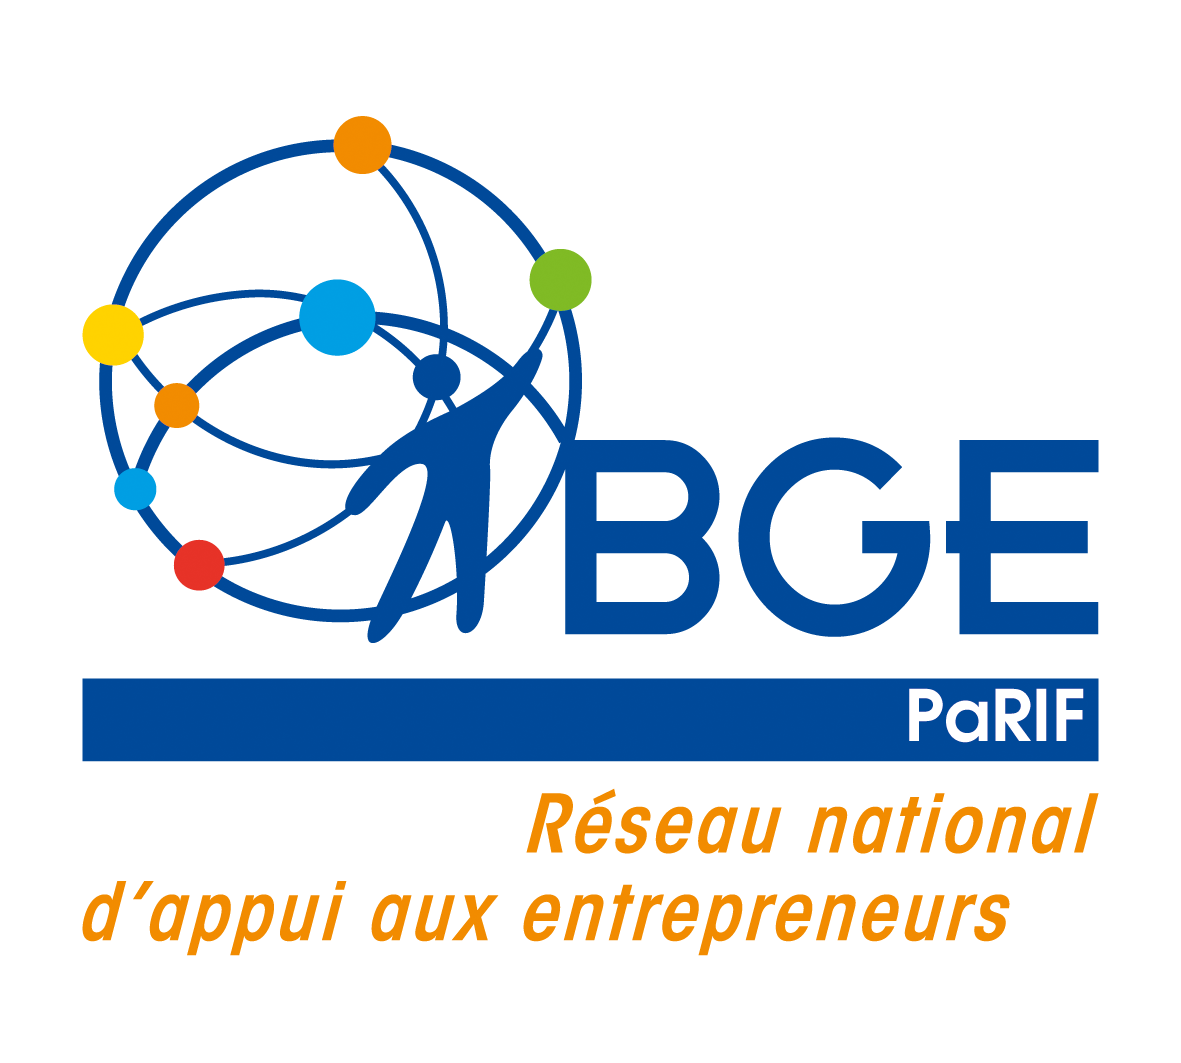 SSD_logo_bge_parif.png